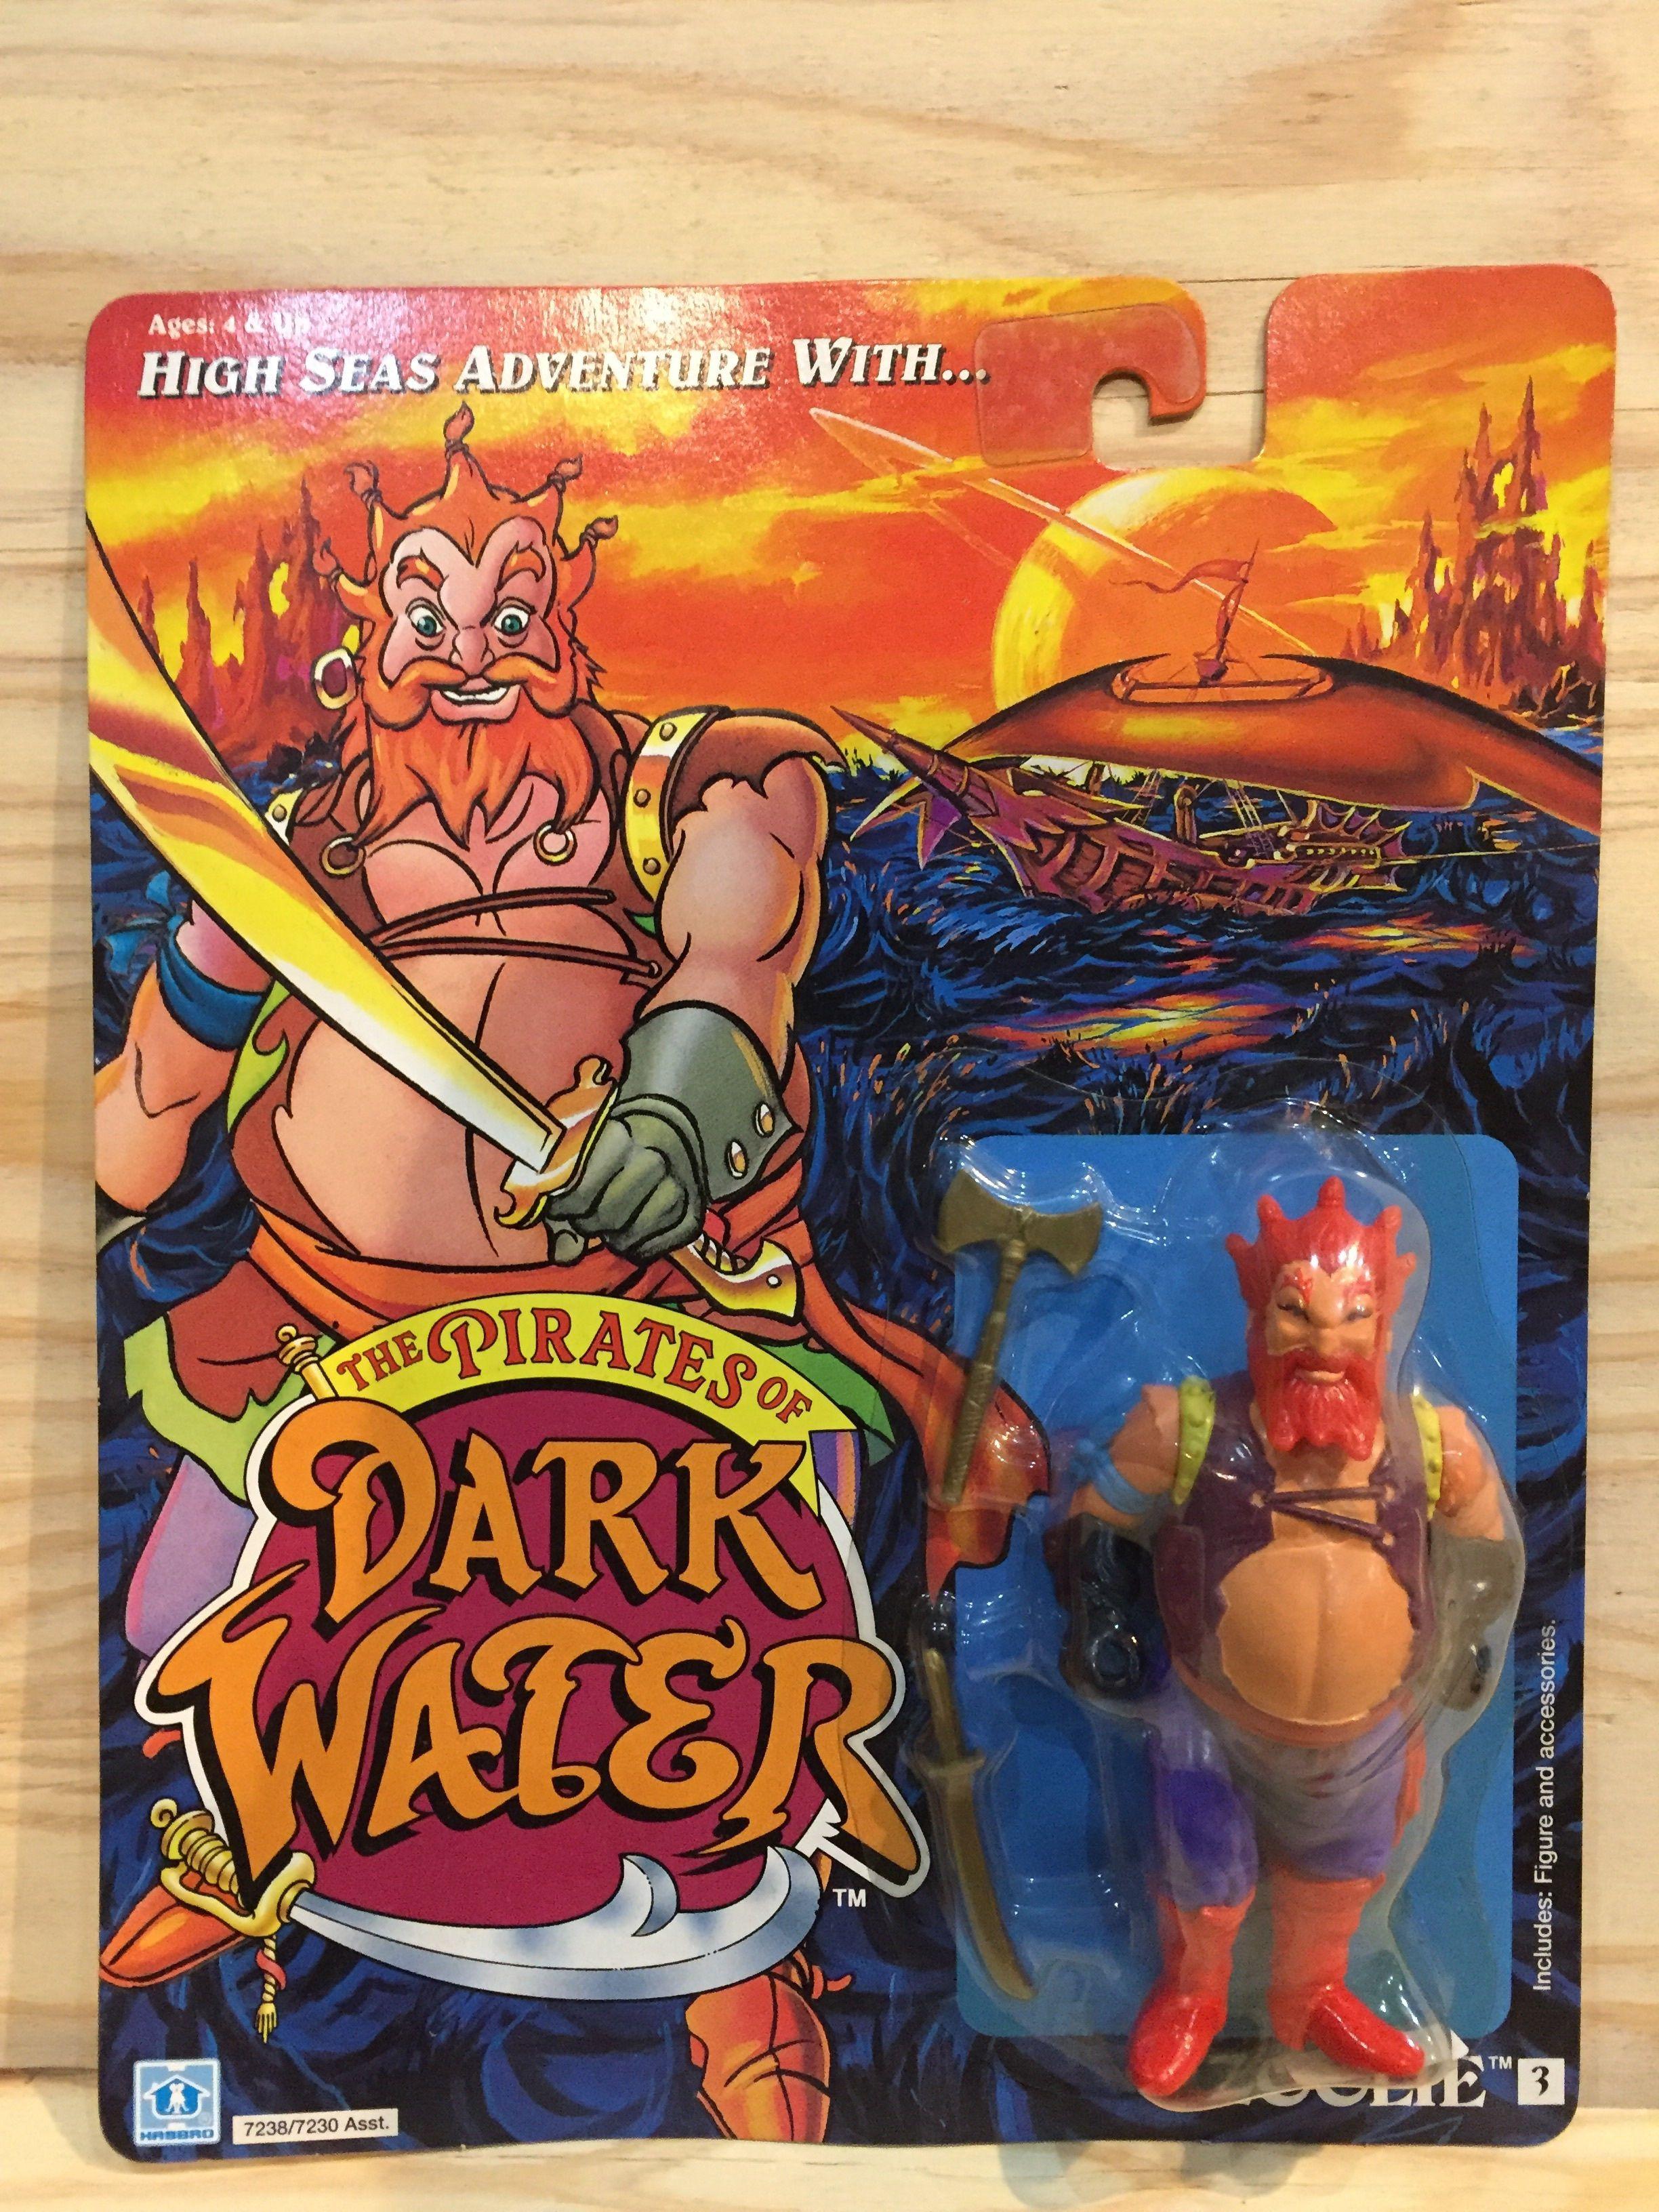 THE PIRATES OF DARK WATER(ZOOLIE)